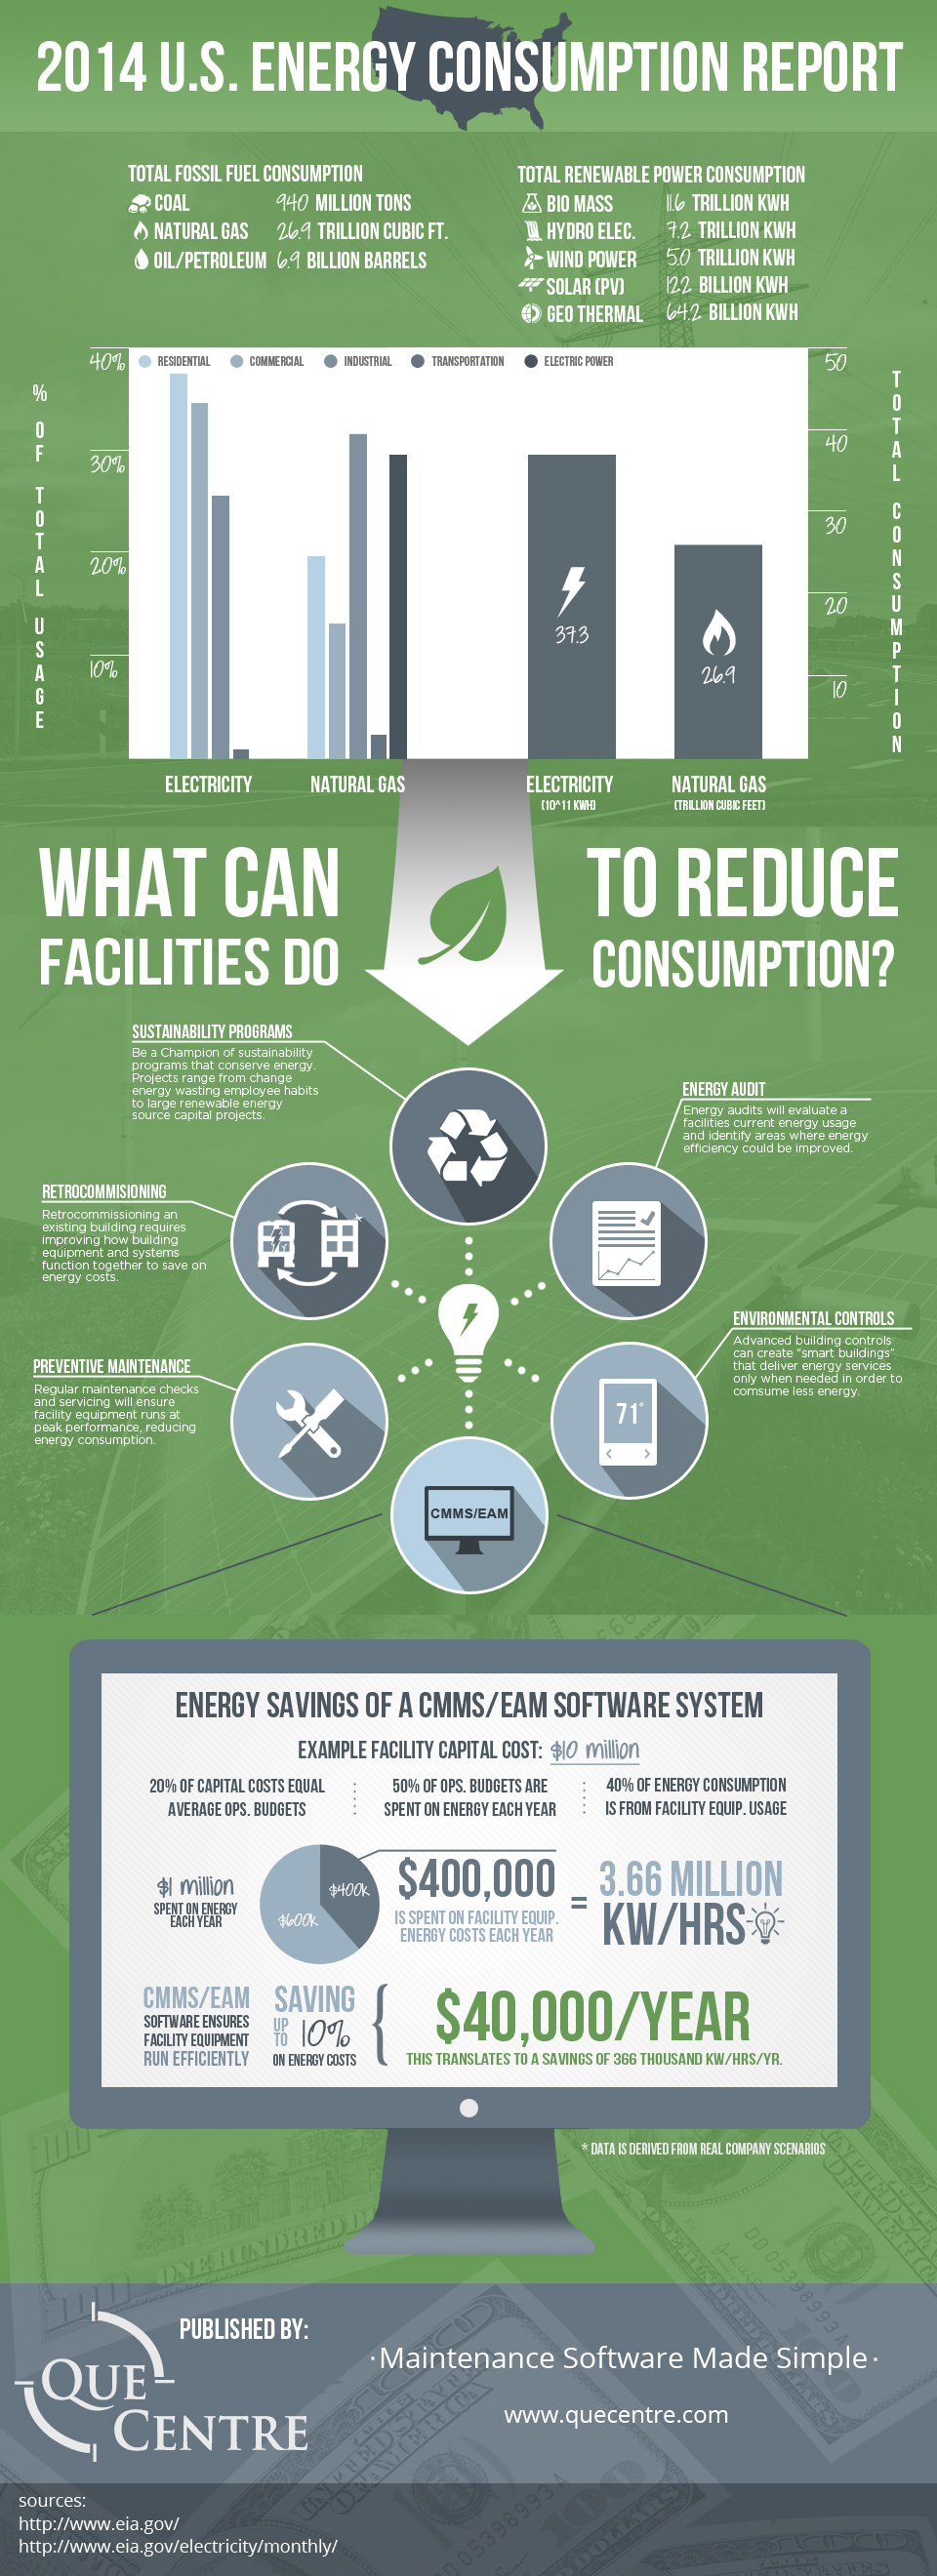 2014-us-energy-consumption-report